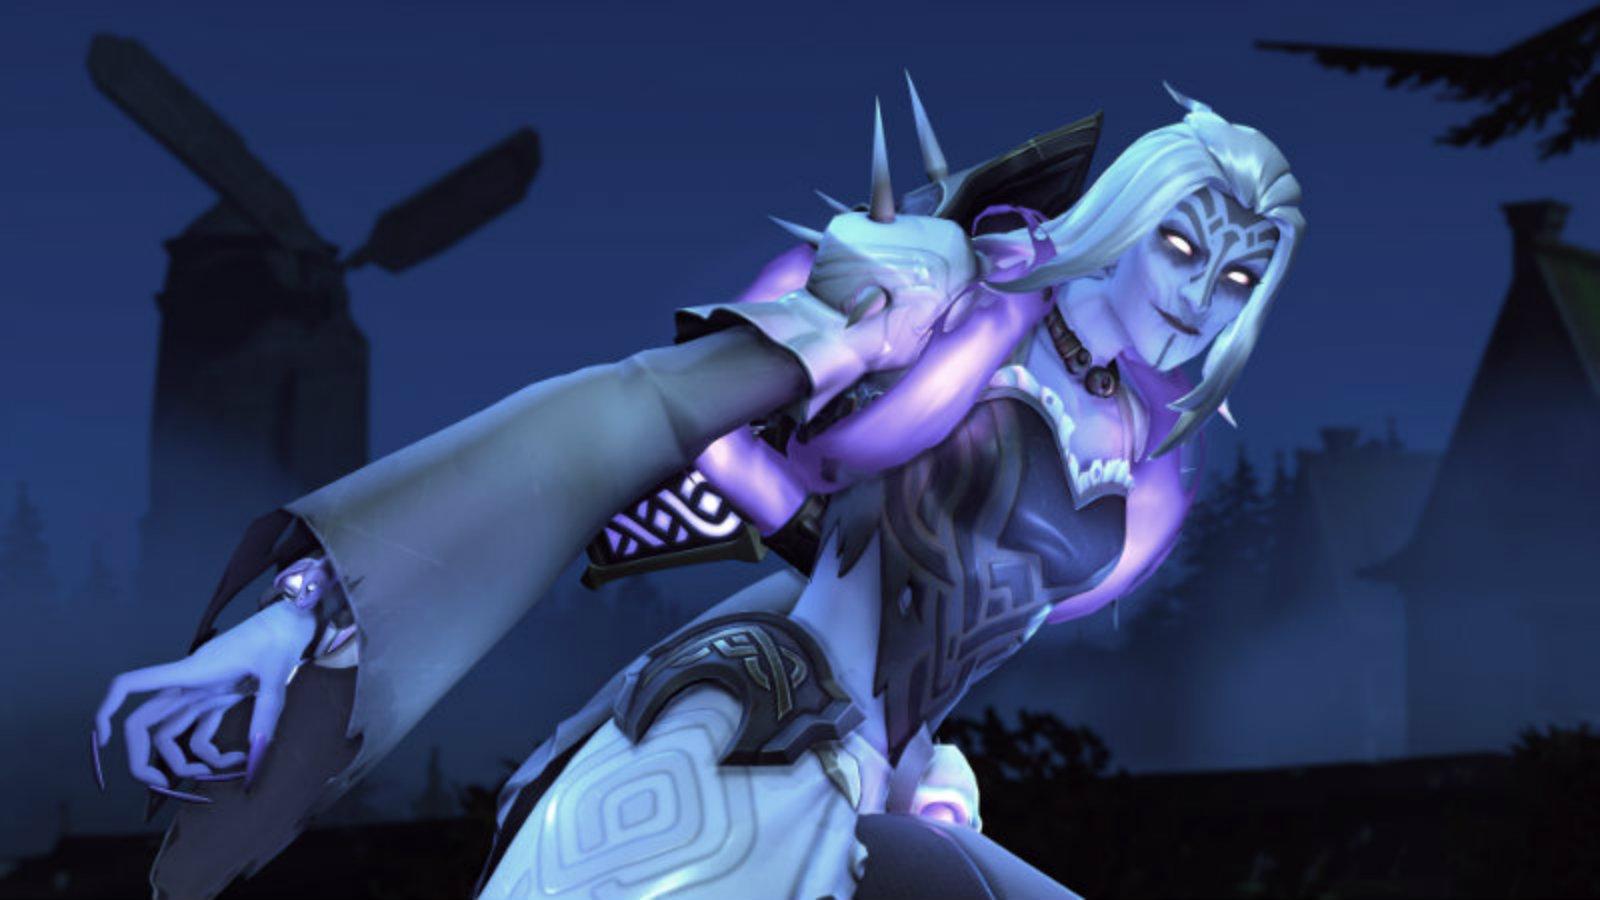 Moira in her Halloween Overwatch skin